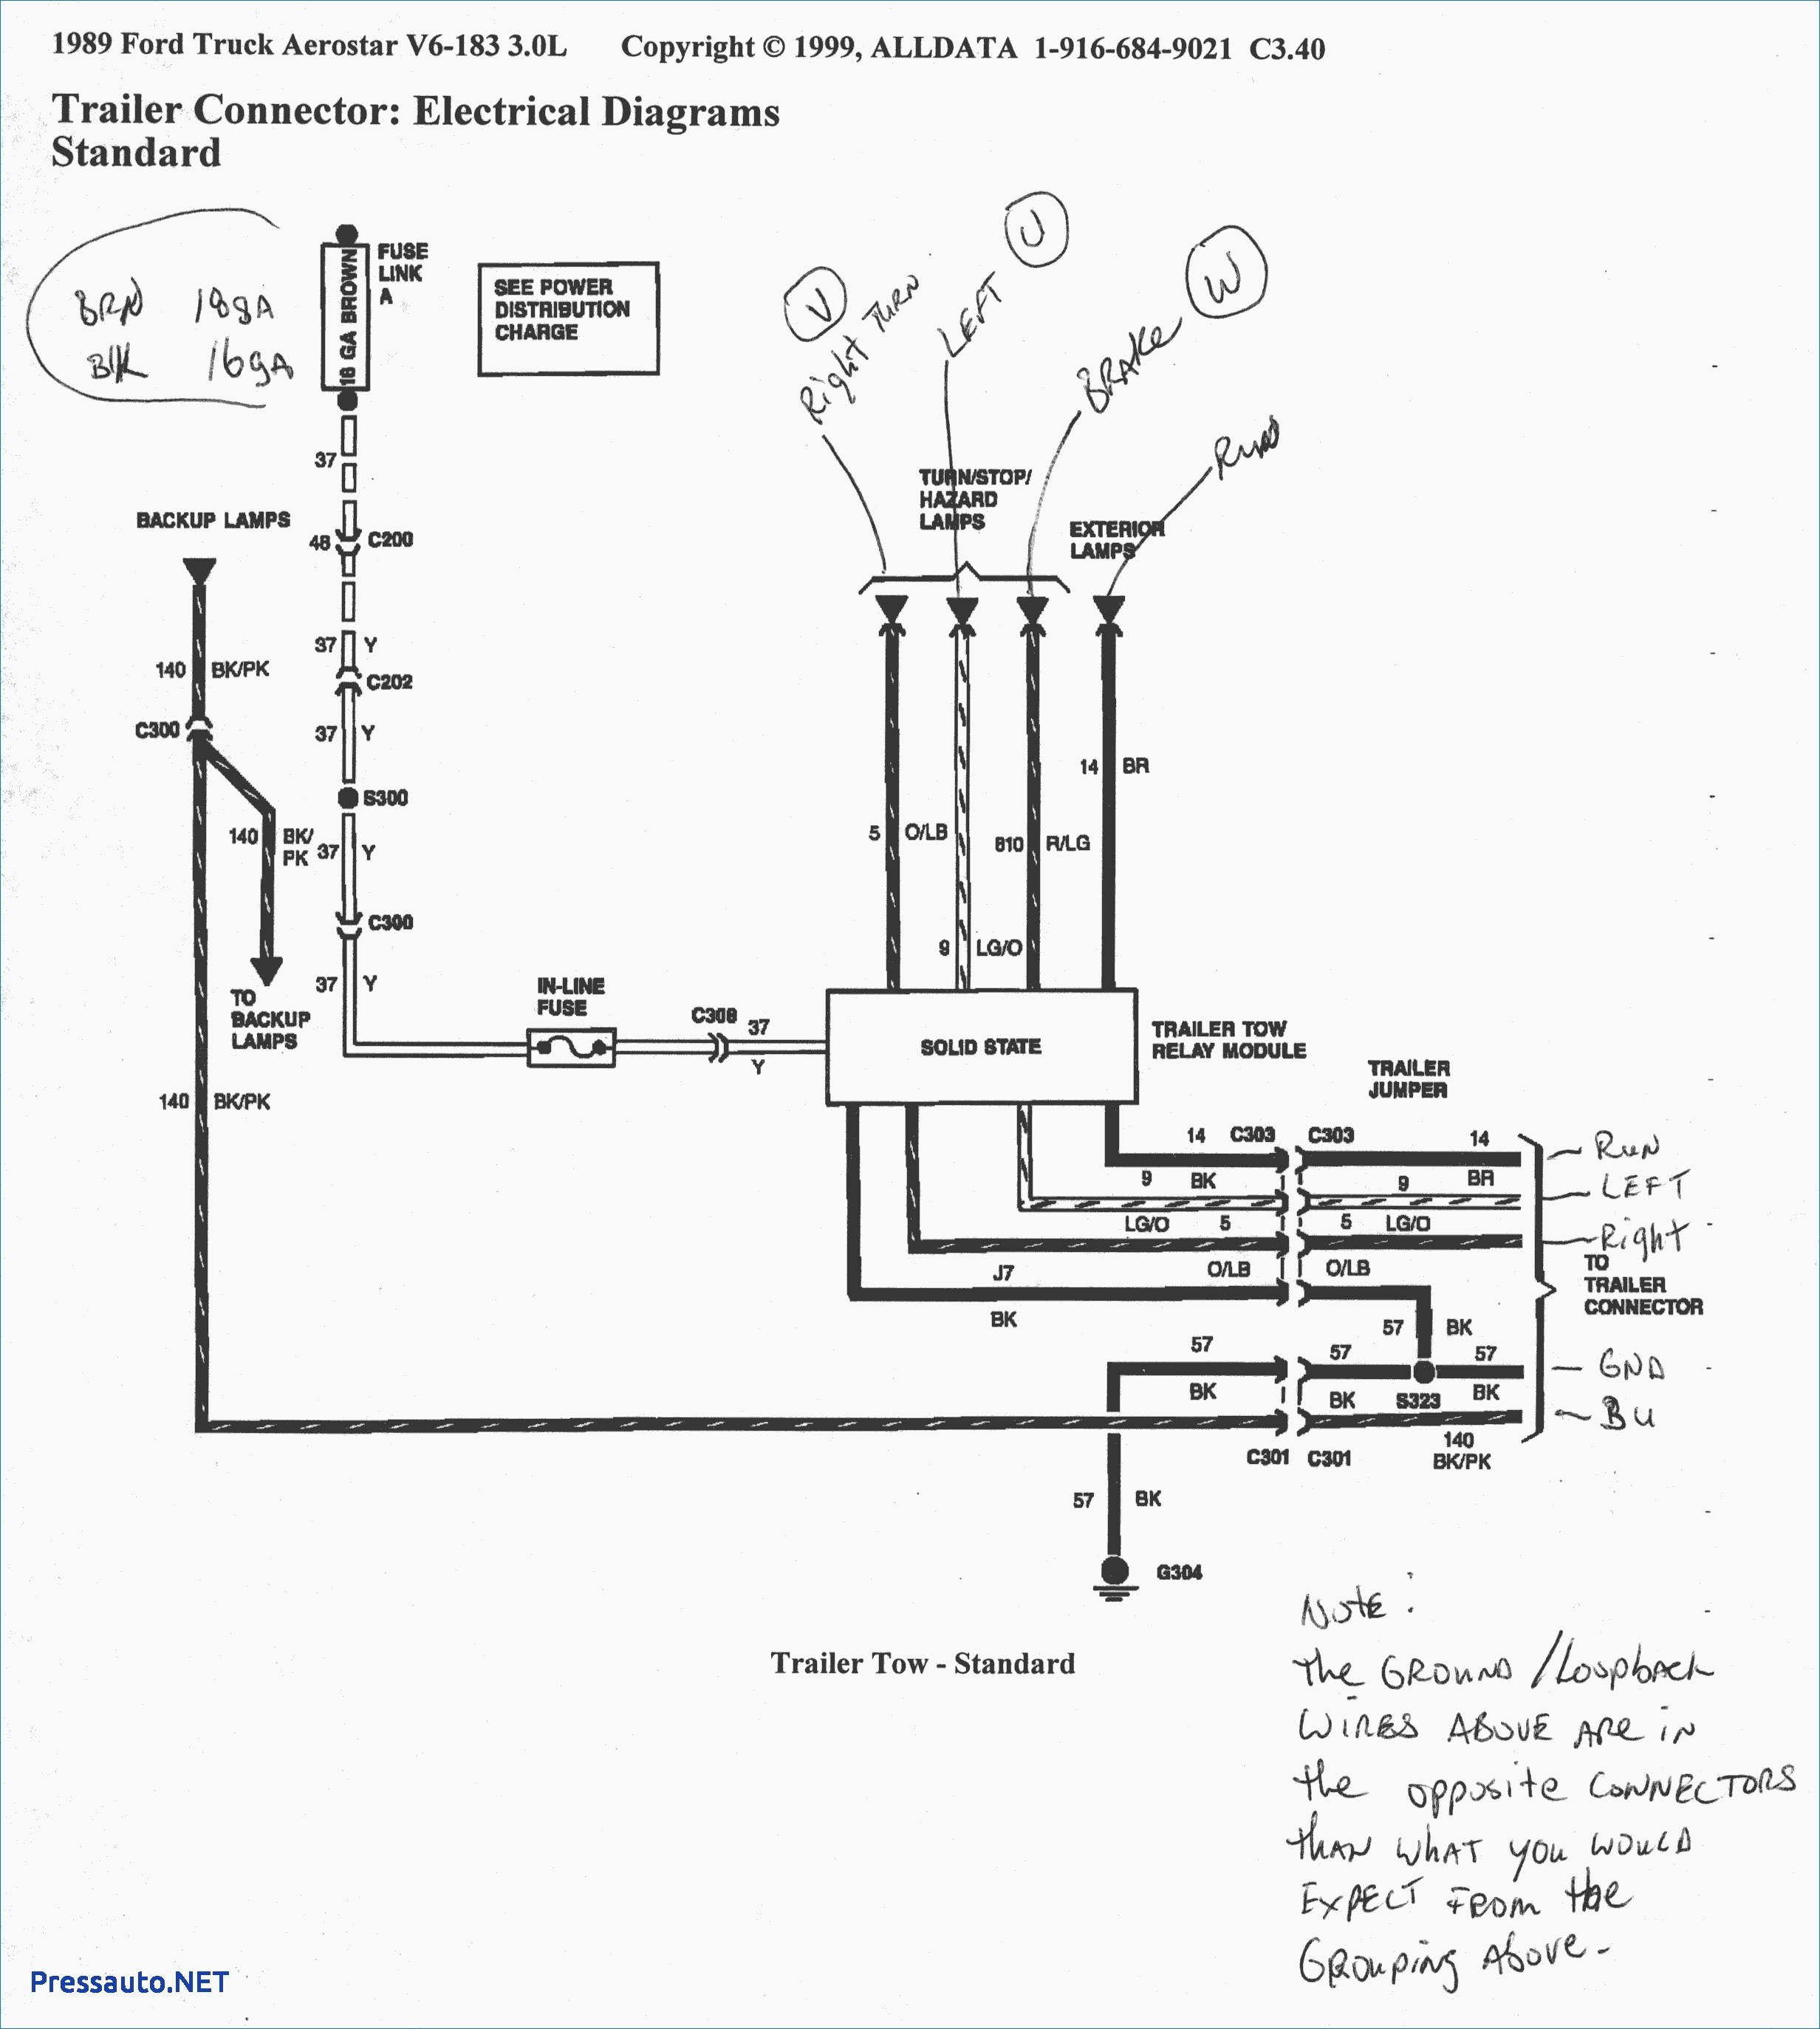 2000 ford trailer wiring diagram - wiring diagram export dry-remark -  dry-remark.congressosifo2018.it  congressosifo2018.it